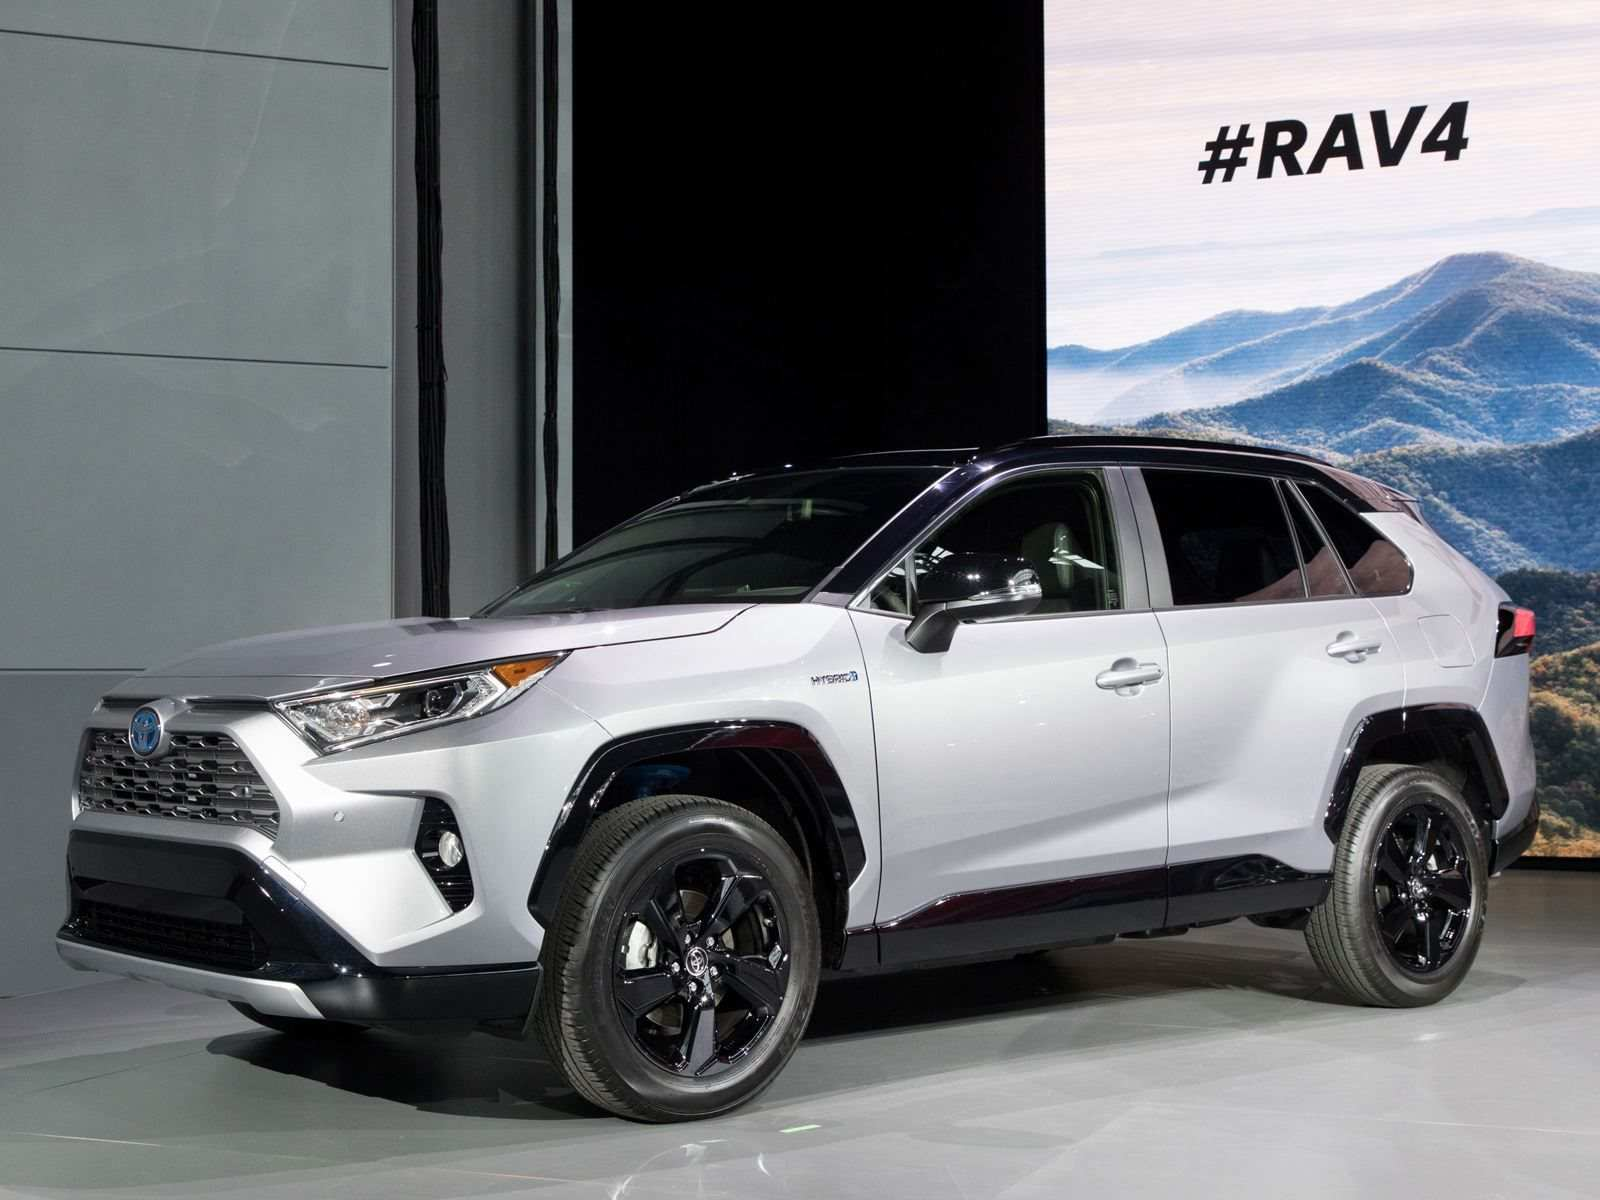 48 Best Review Best Toyota 2019 Rav4 Specs Price Performance by Best Toyota 2019 Rav4 Specs Price